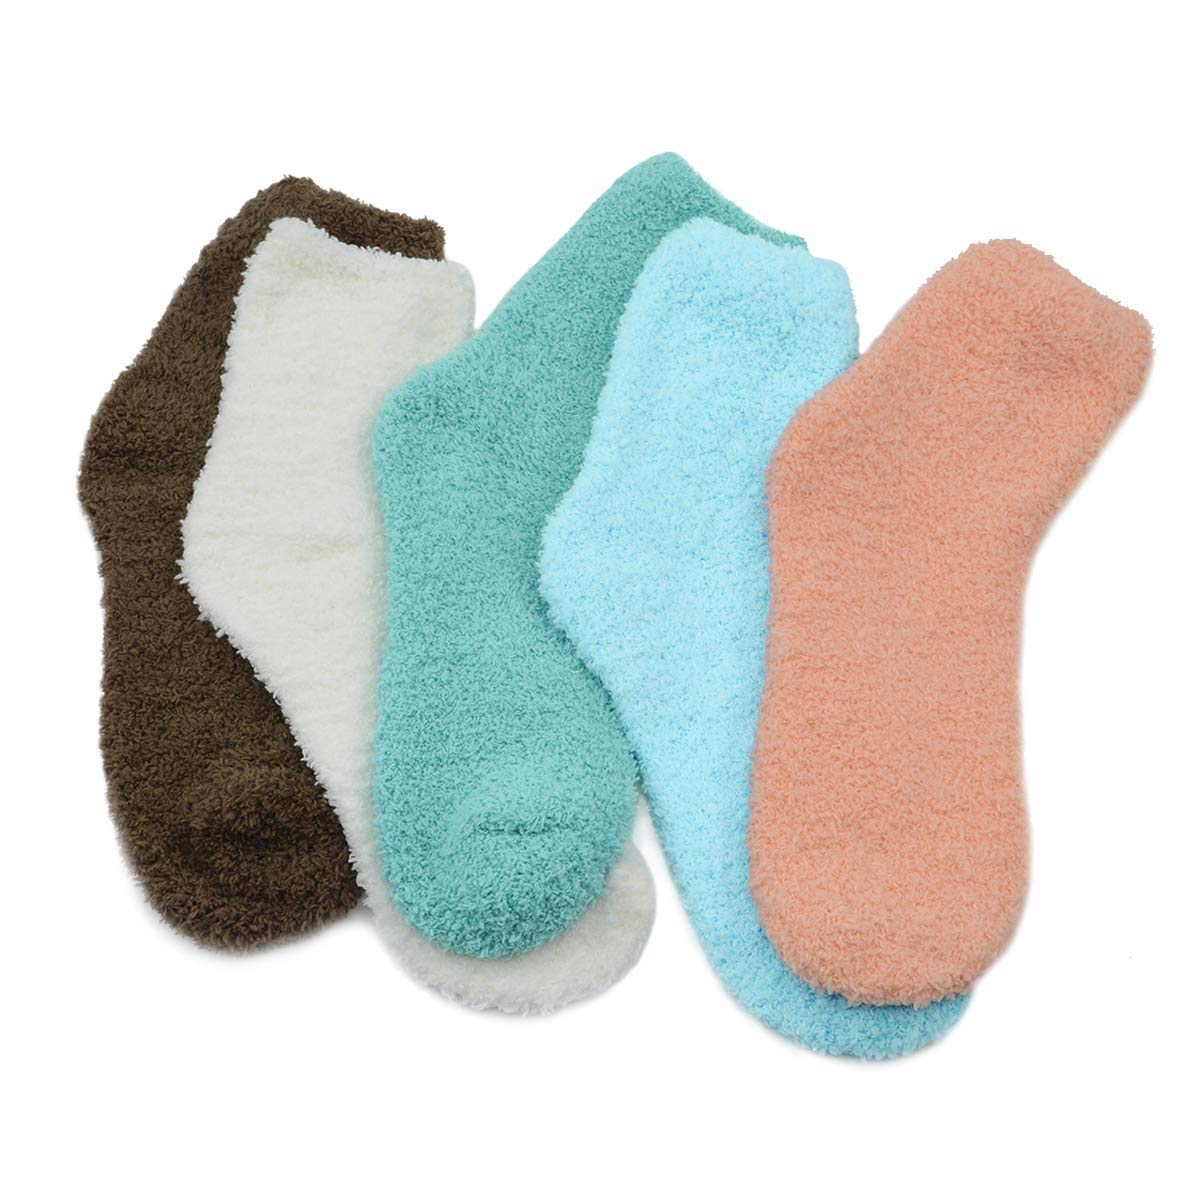 Fuzzy Warm Slipper Socks Women Super Soft Microfiber Cozy Sleeping Socks 6 or 5 Pairs Azue SOC10022AUUS